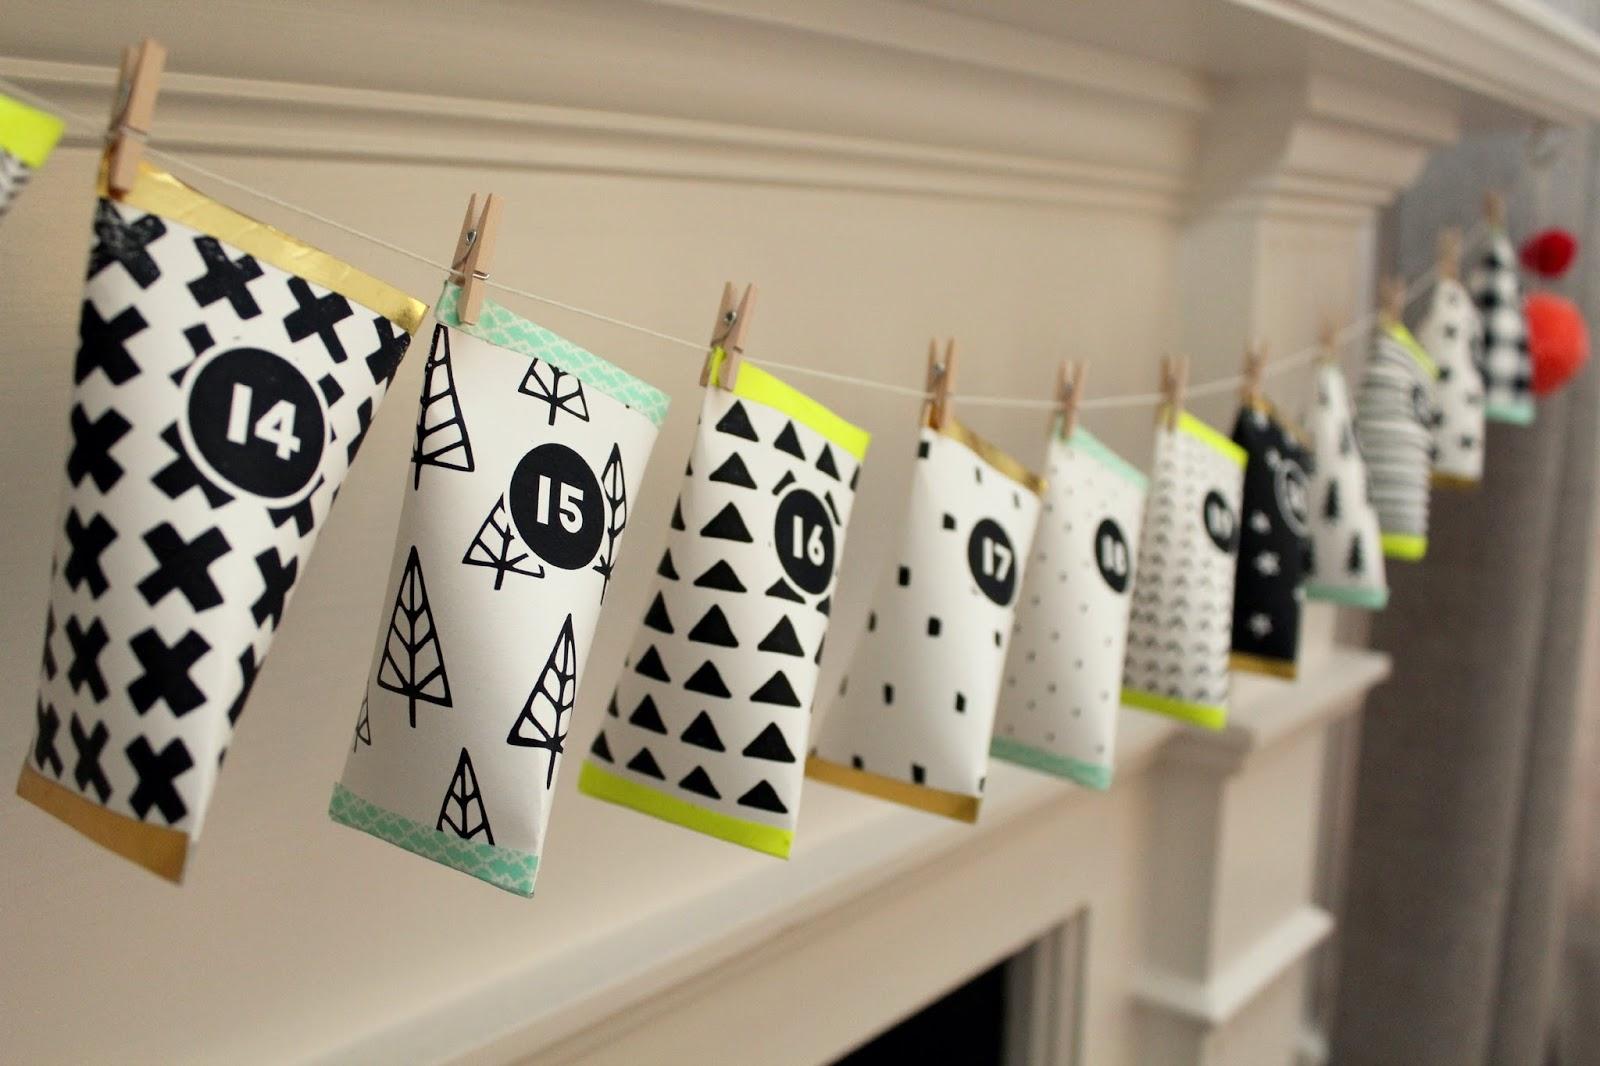 Advent Calendar Village Diy : Musings of an average mom christmas advent calendar